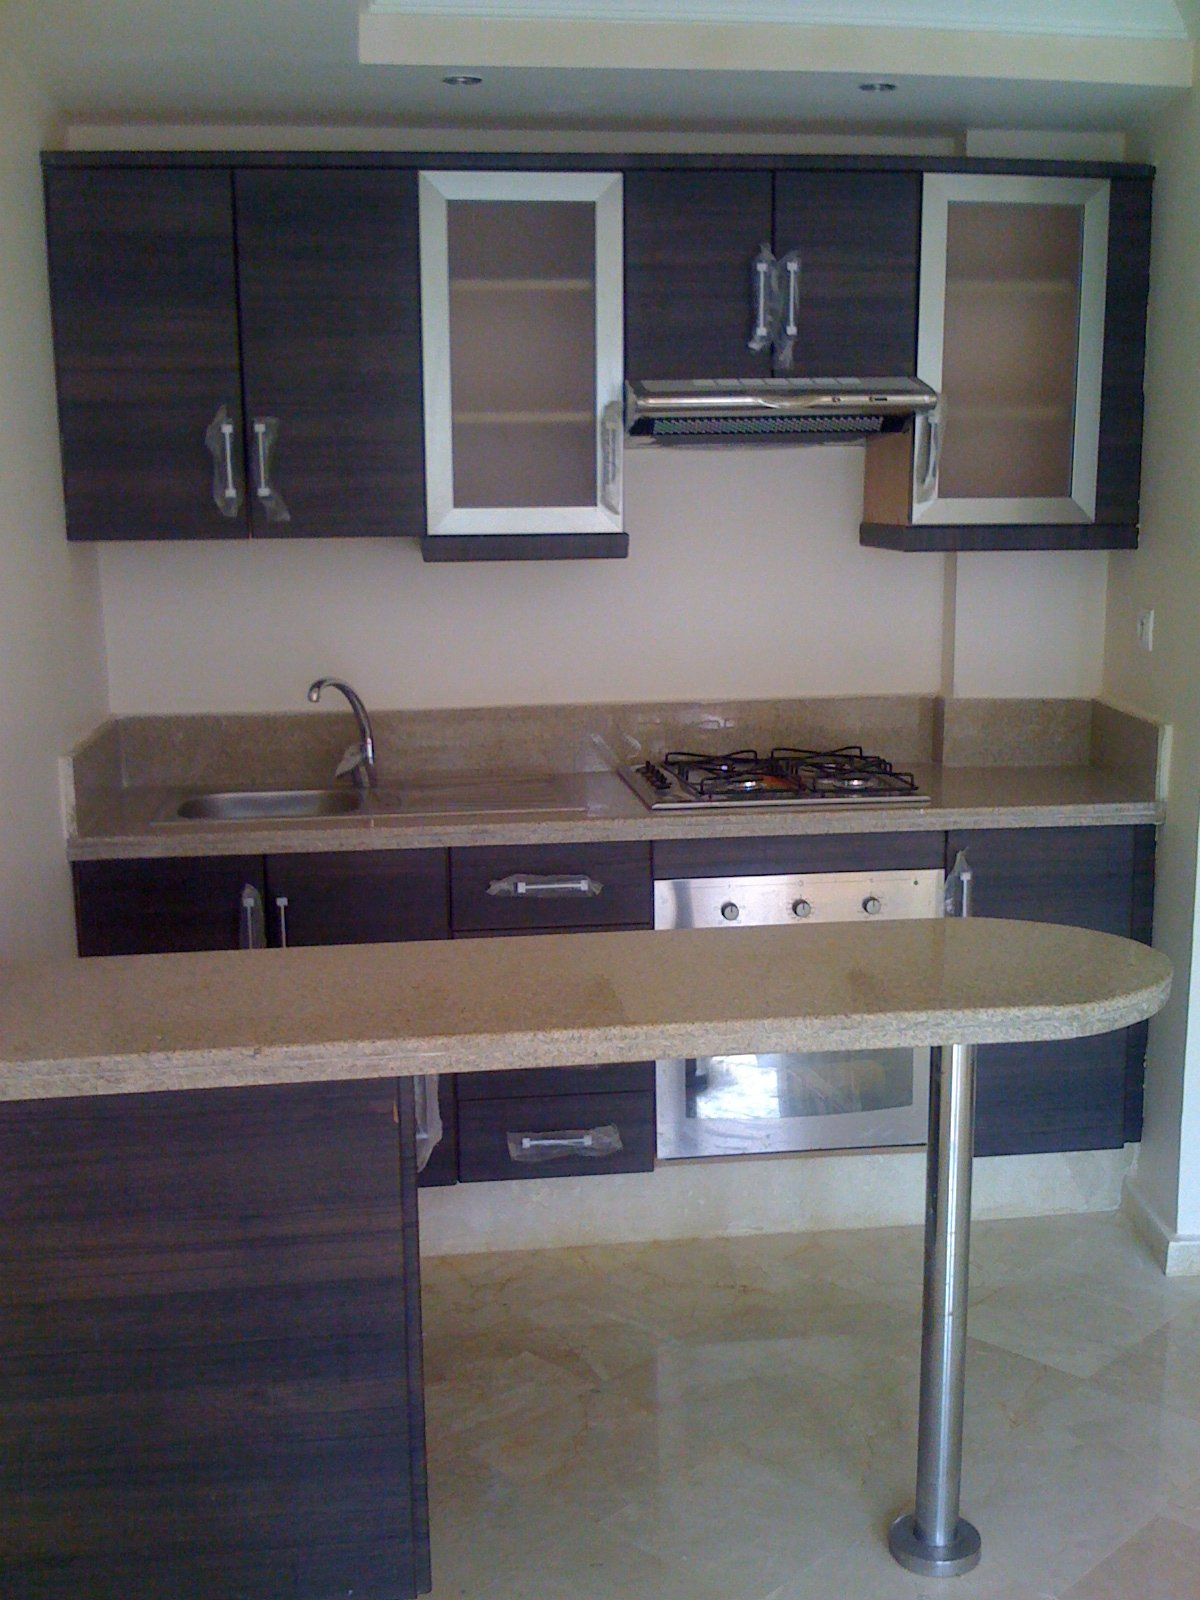 professionel espagnol fabricant de cuisine pour equiper vos projets immobliers iberiachats. Black Bedroom Furniture Sets. Home Design Ideas